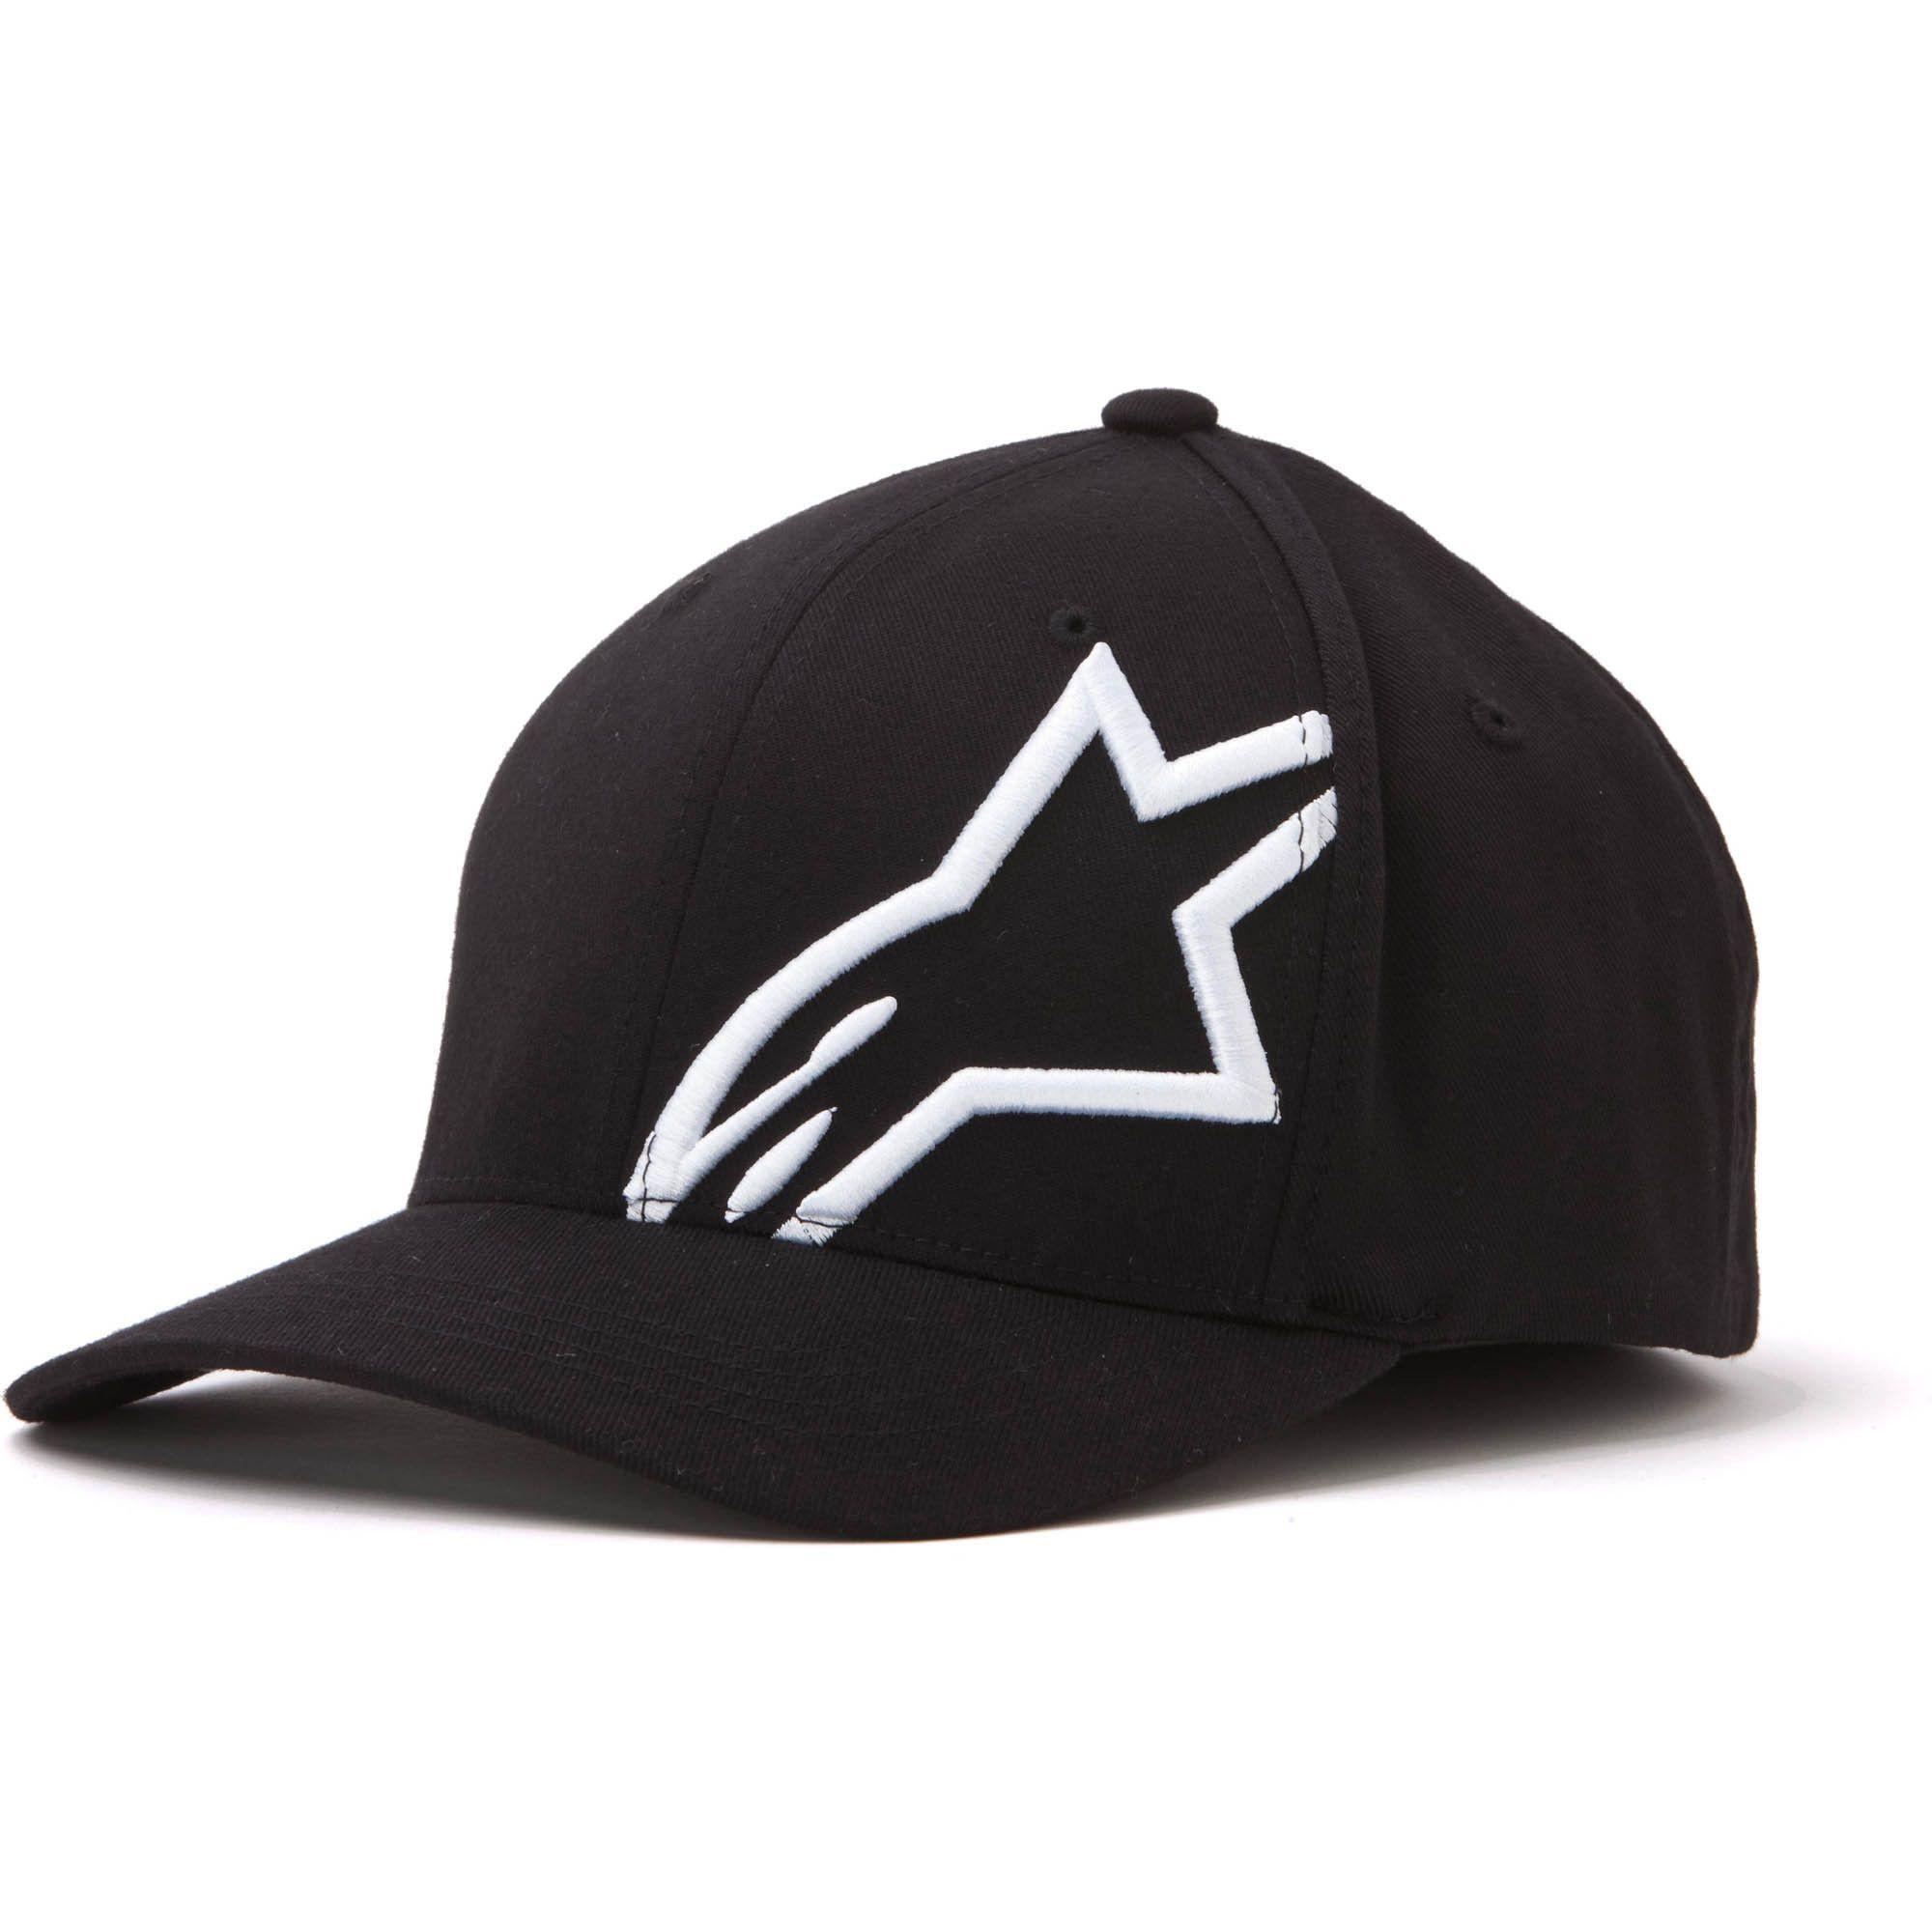 Alpinestars Maximum Mens Flat Motorcycle Street Flat Bill Hats